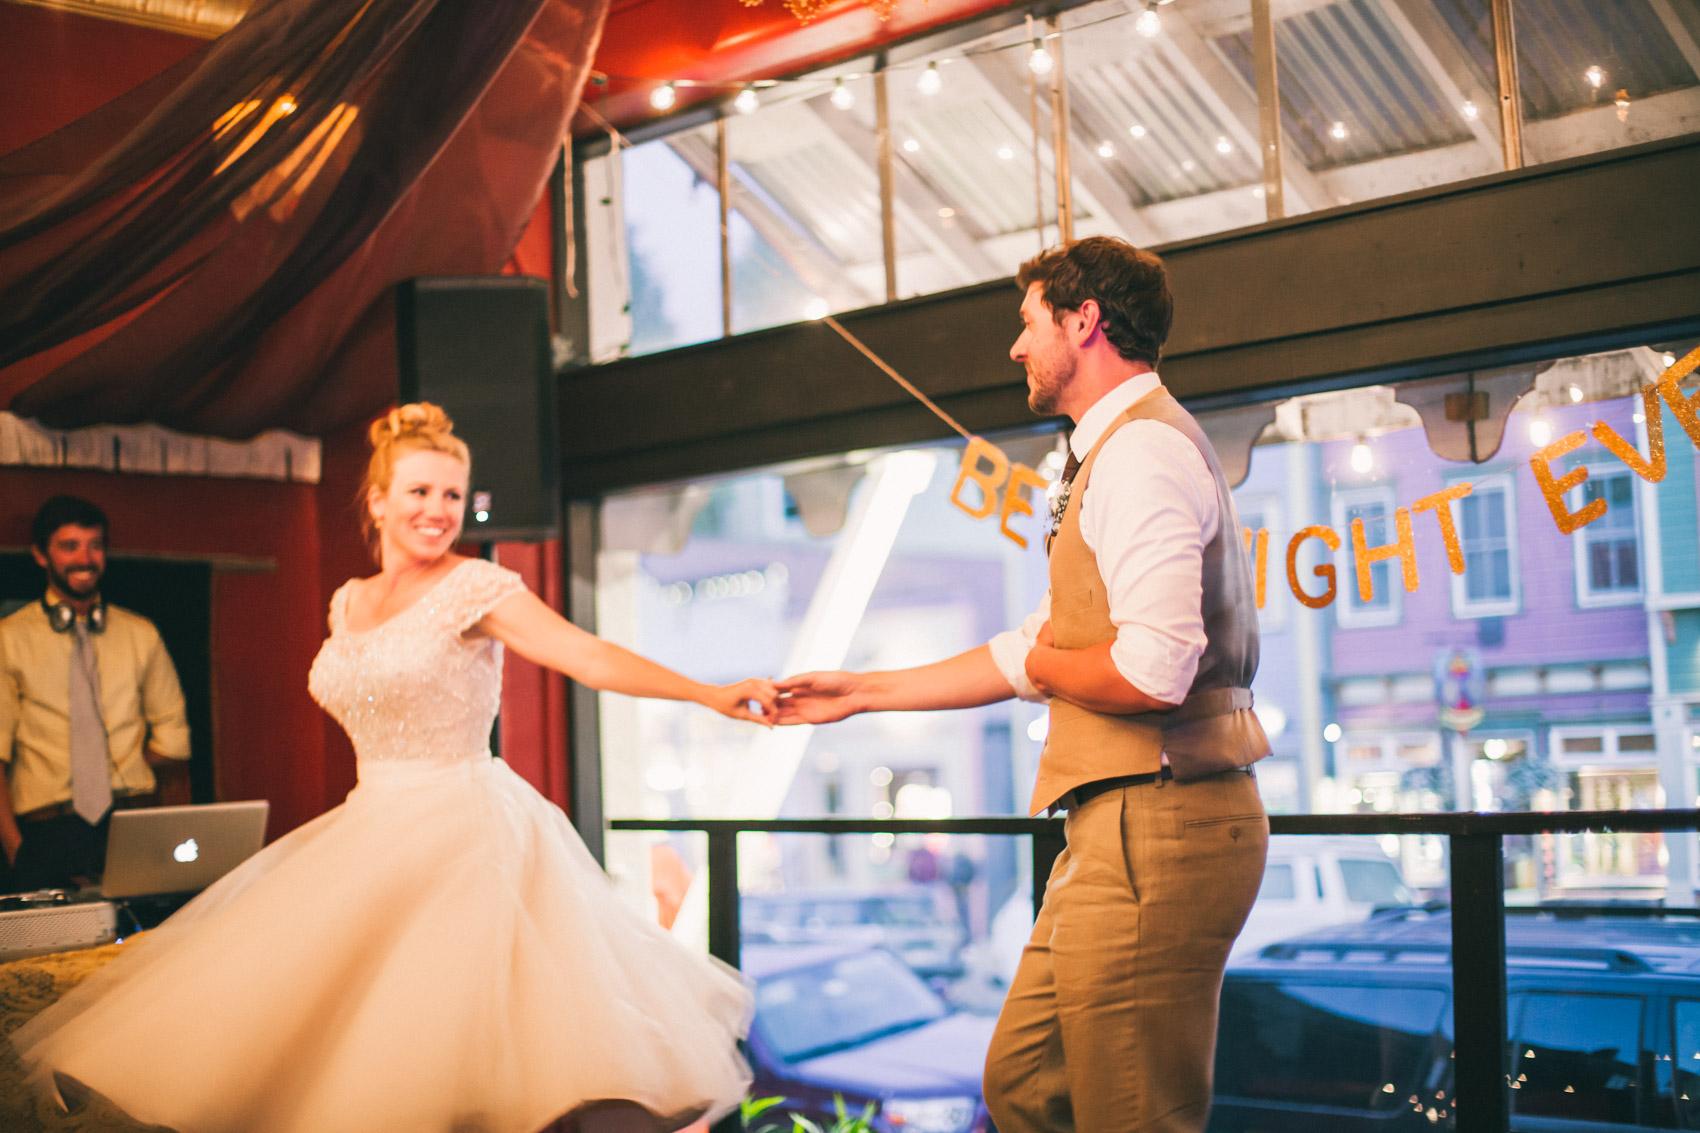 052_Crested Butte Wedding Photographer Secret Stash Woods Walk Ceremony Jamie Blue Bird Events Boho Epic Stars